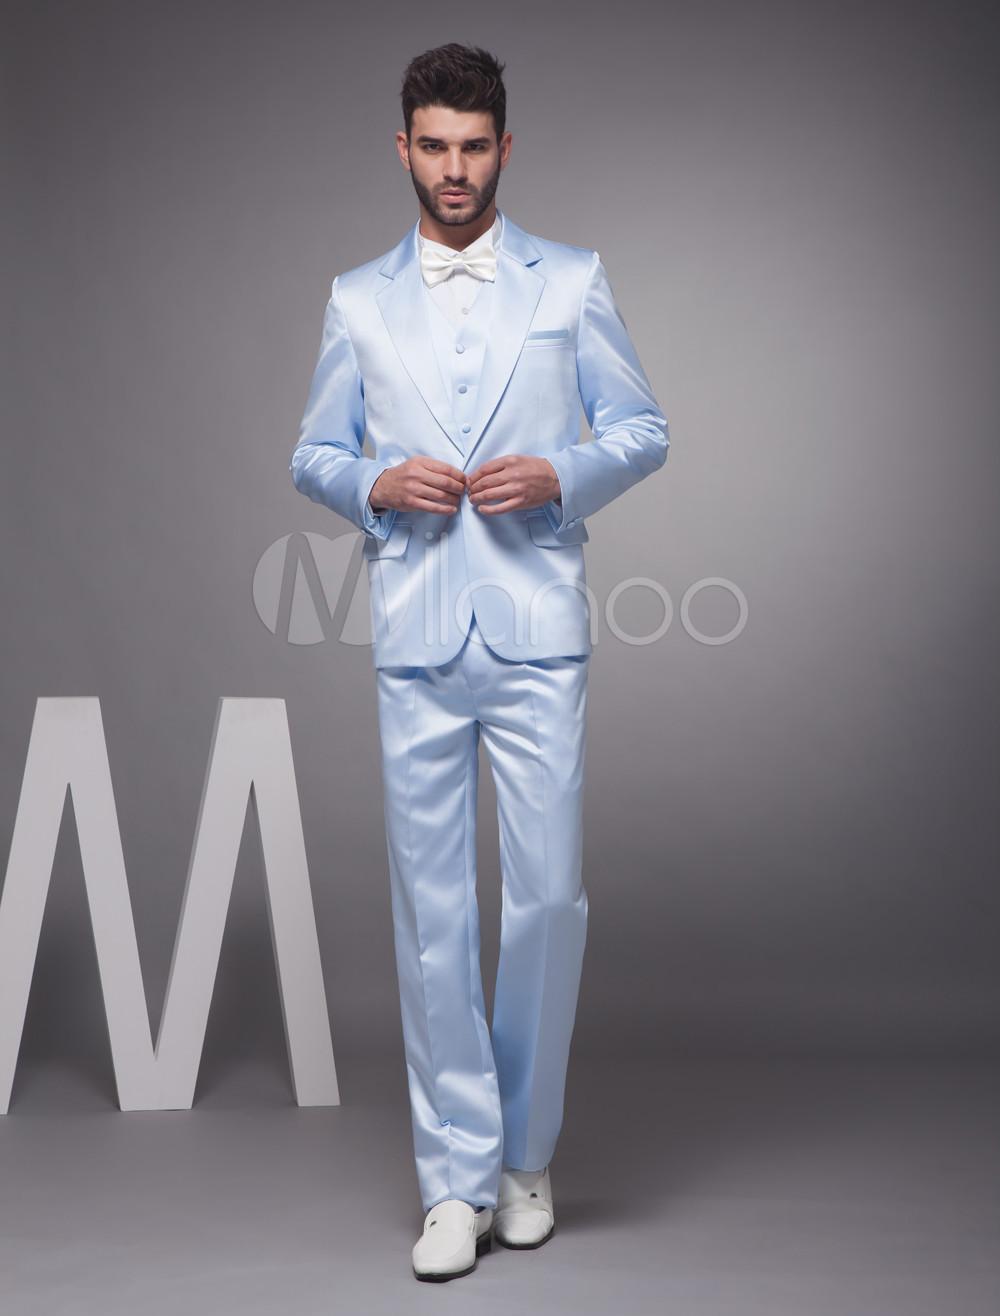 6fc60622f92e1 ... 新郎スーツ,ブルー タキシード オーダーメイド可能 セット 結婚式スーツ パーティー ゥェディング -No. 12. 色  AddThis  Sharing Buttons